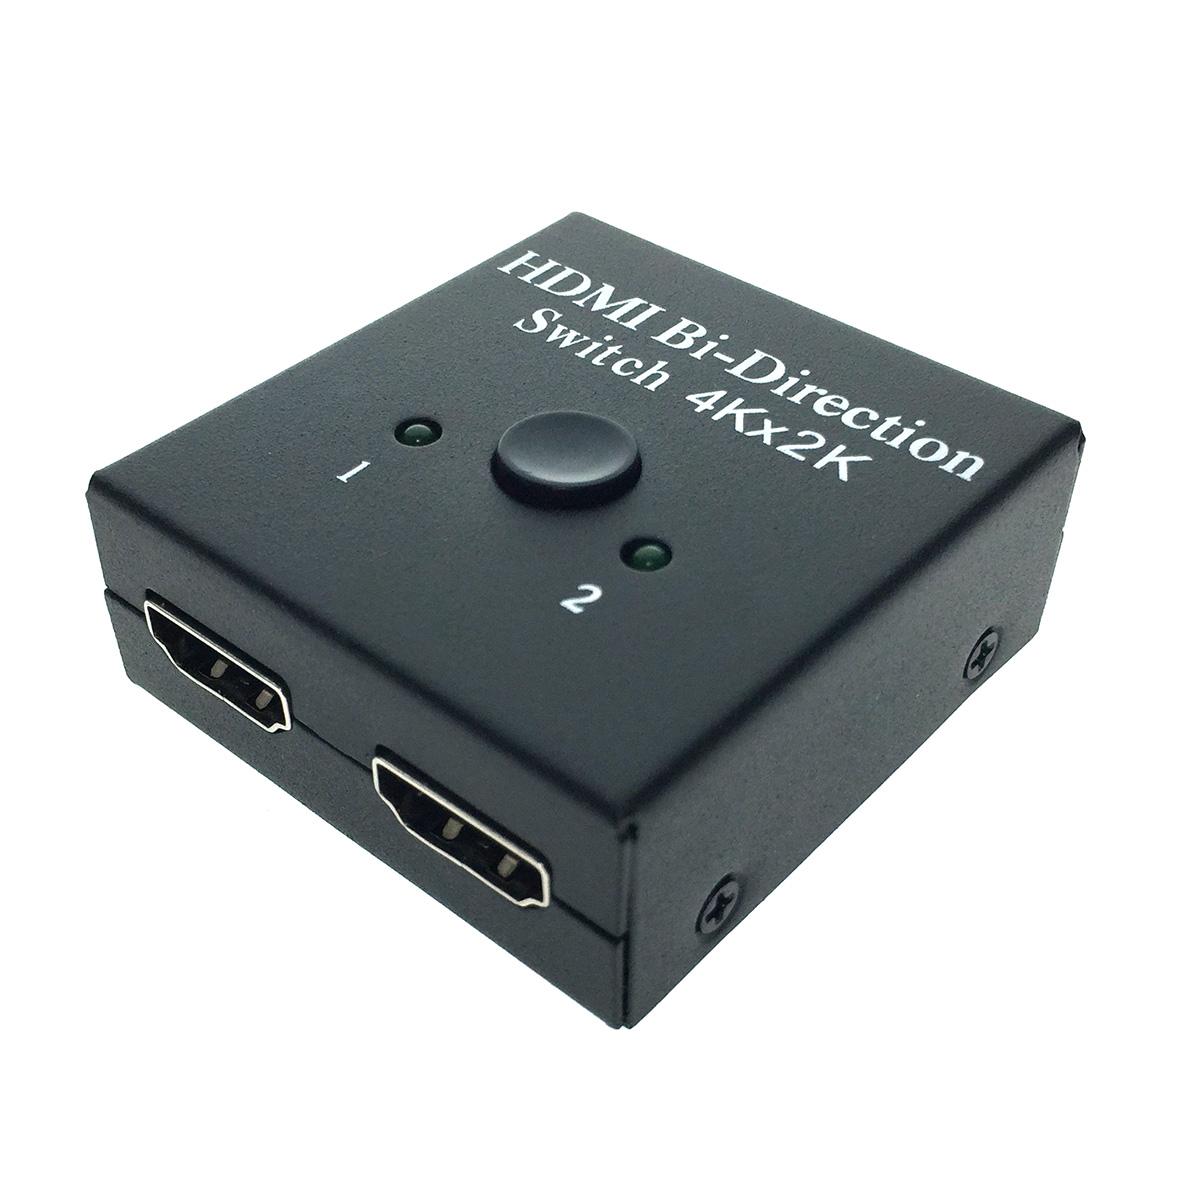 HDMI переключатель двунаправленный 2Х1 4K Espada Eswbi21